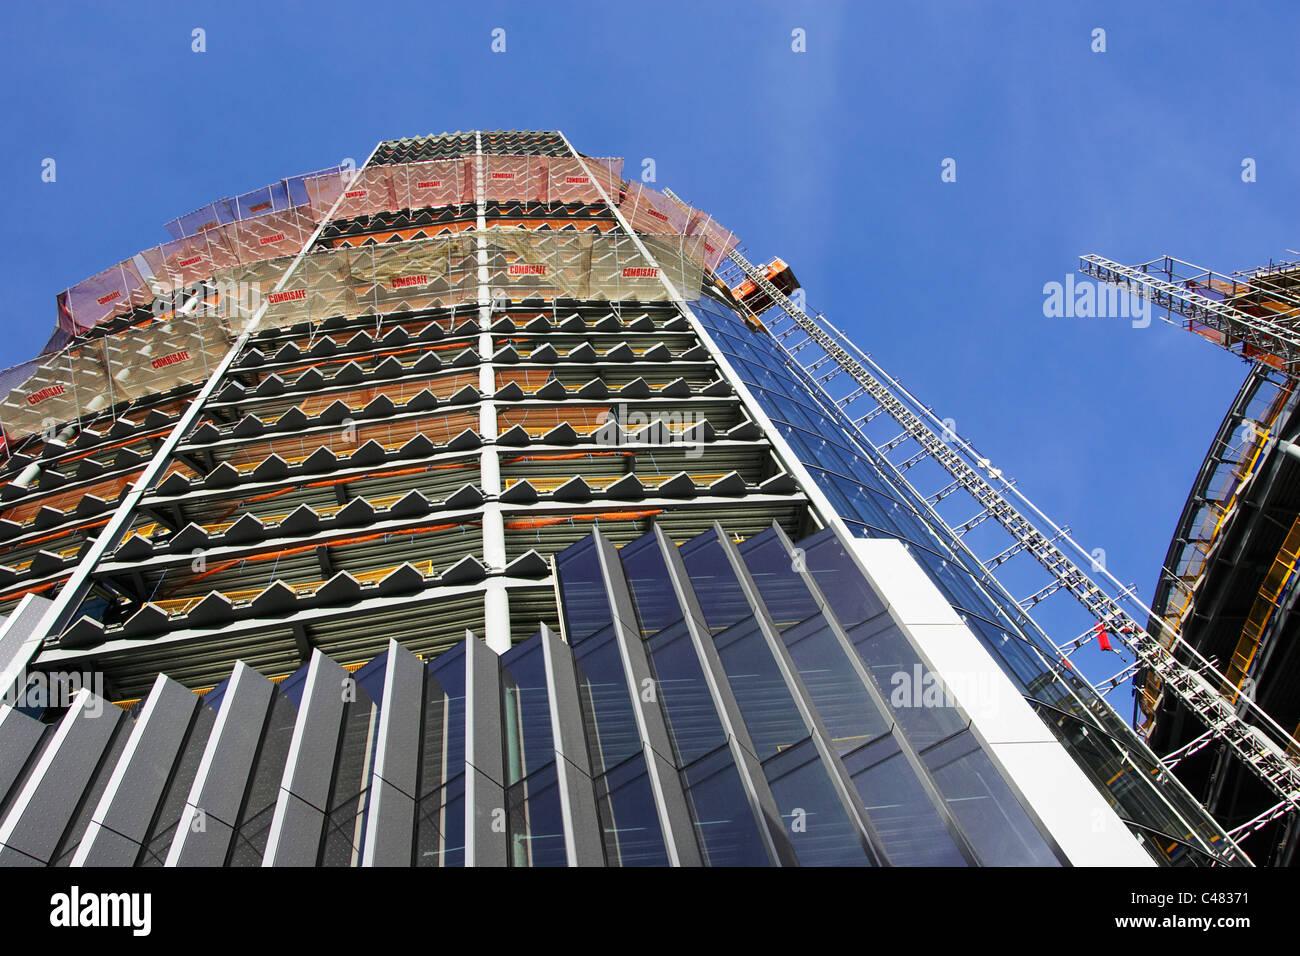 The Willis Building This 44 130 Sq M 475 000 Sq Ft Development